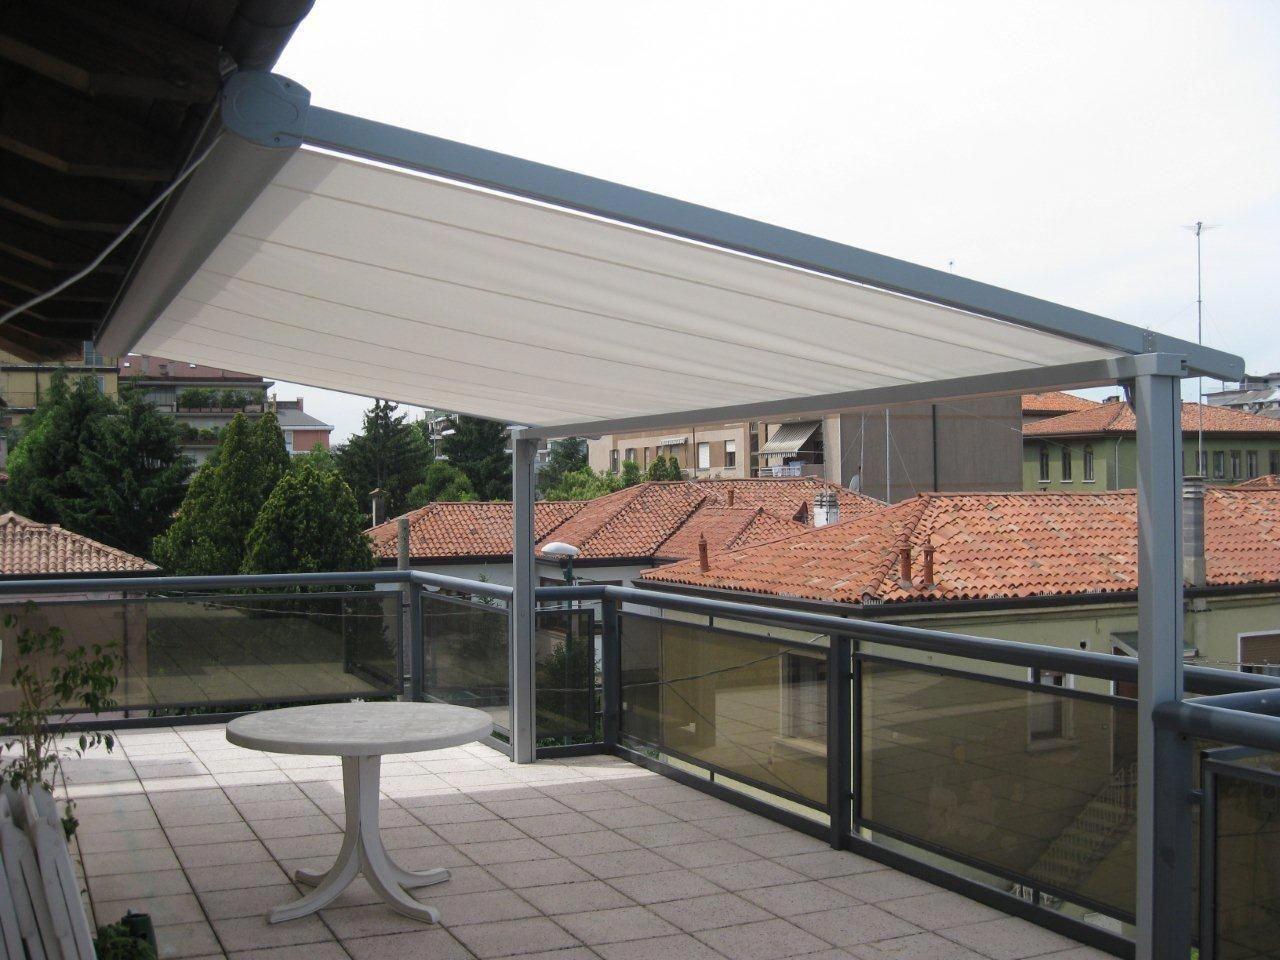 17 Enticing Backyard Canopy Lanterns Ideas Pergola Shade Pergola Canopy Diy Canopy Design